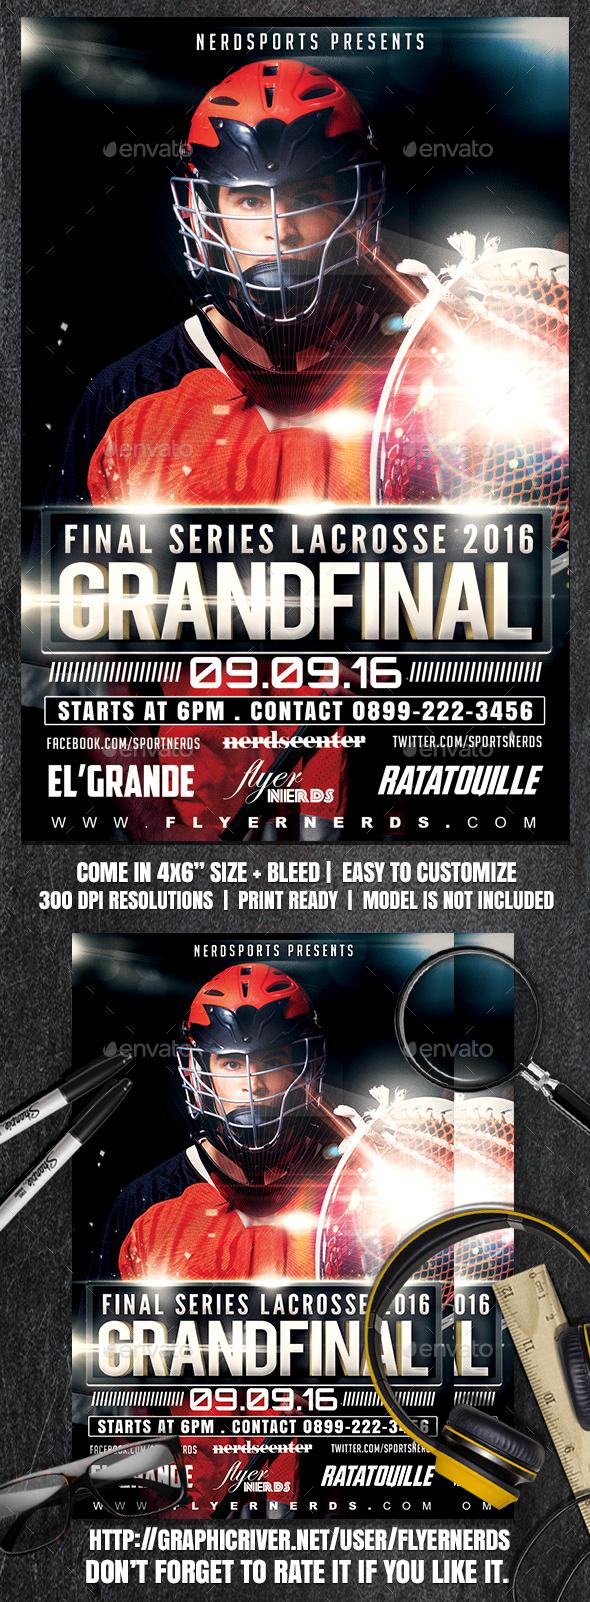 Final Series Lacrosse 2016 Grand Final Sports Flyer - Sports Events